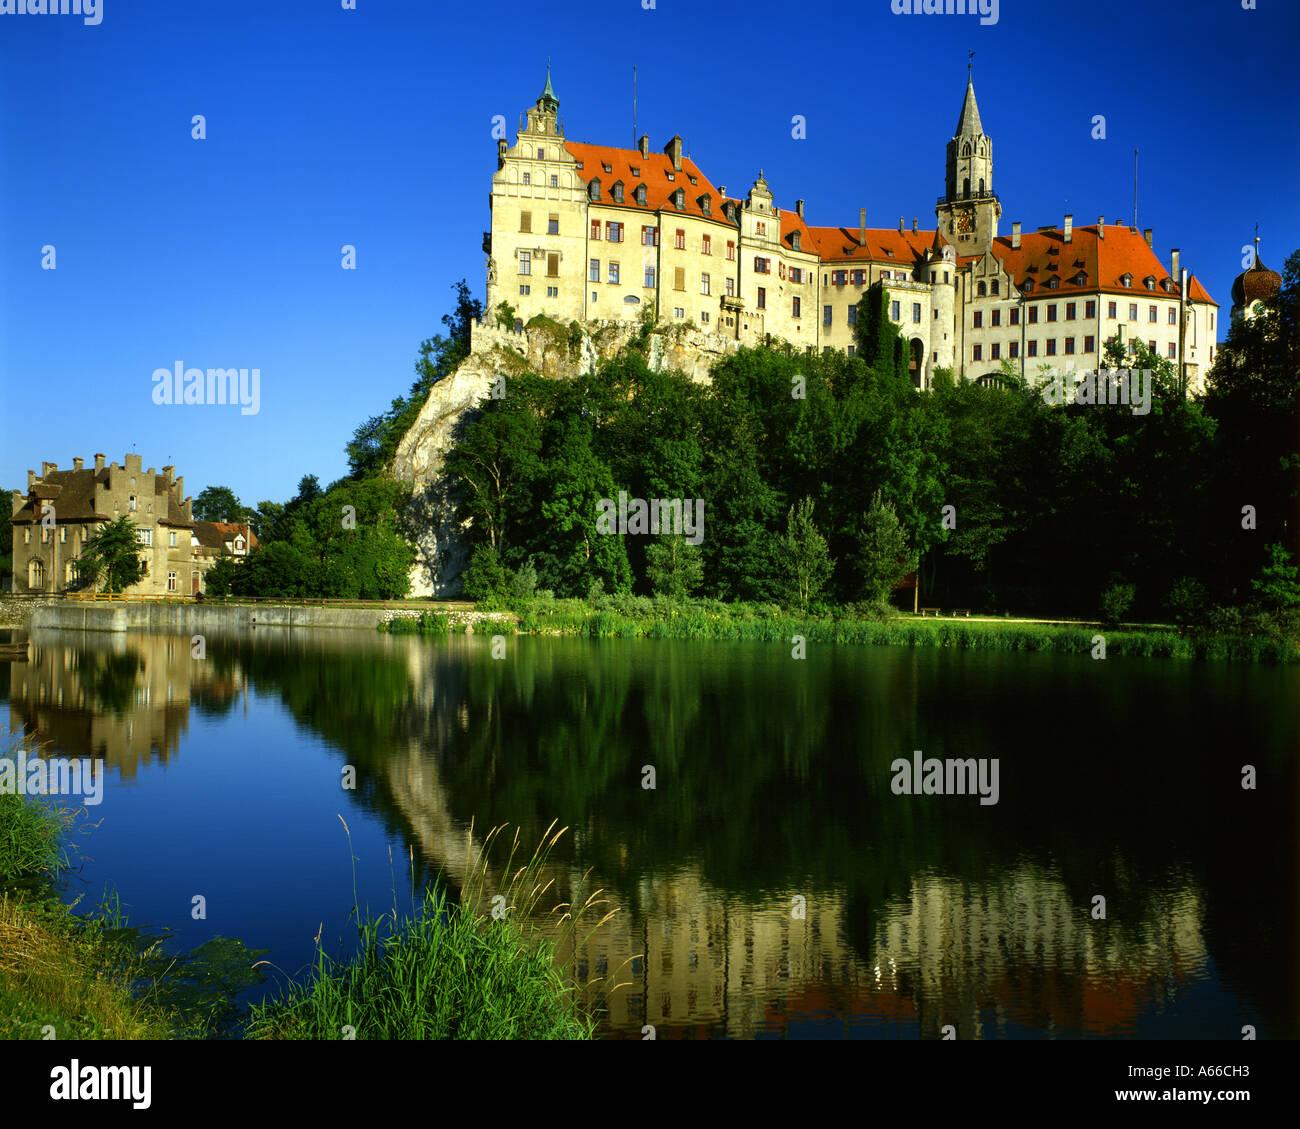 DE - Baden Wurtemberg: au Château de Hohenzollern Sigmaringen et Danube Photo Stock